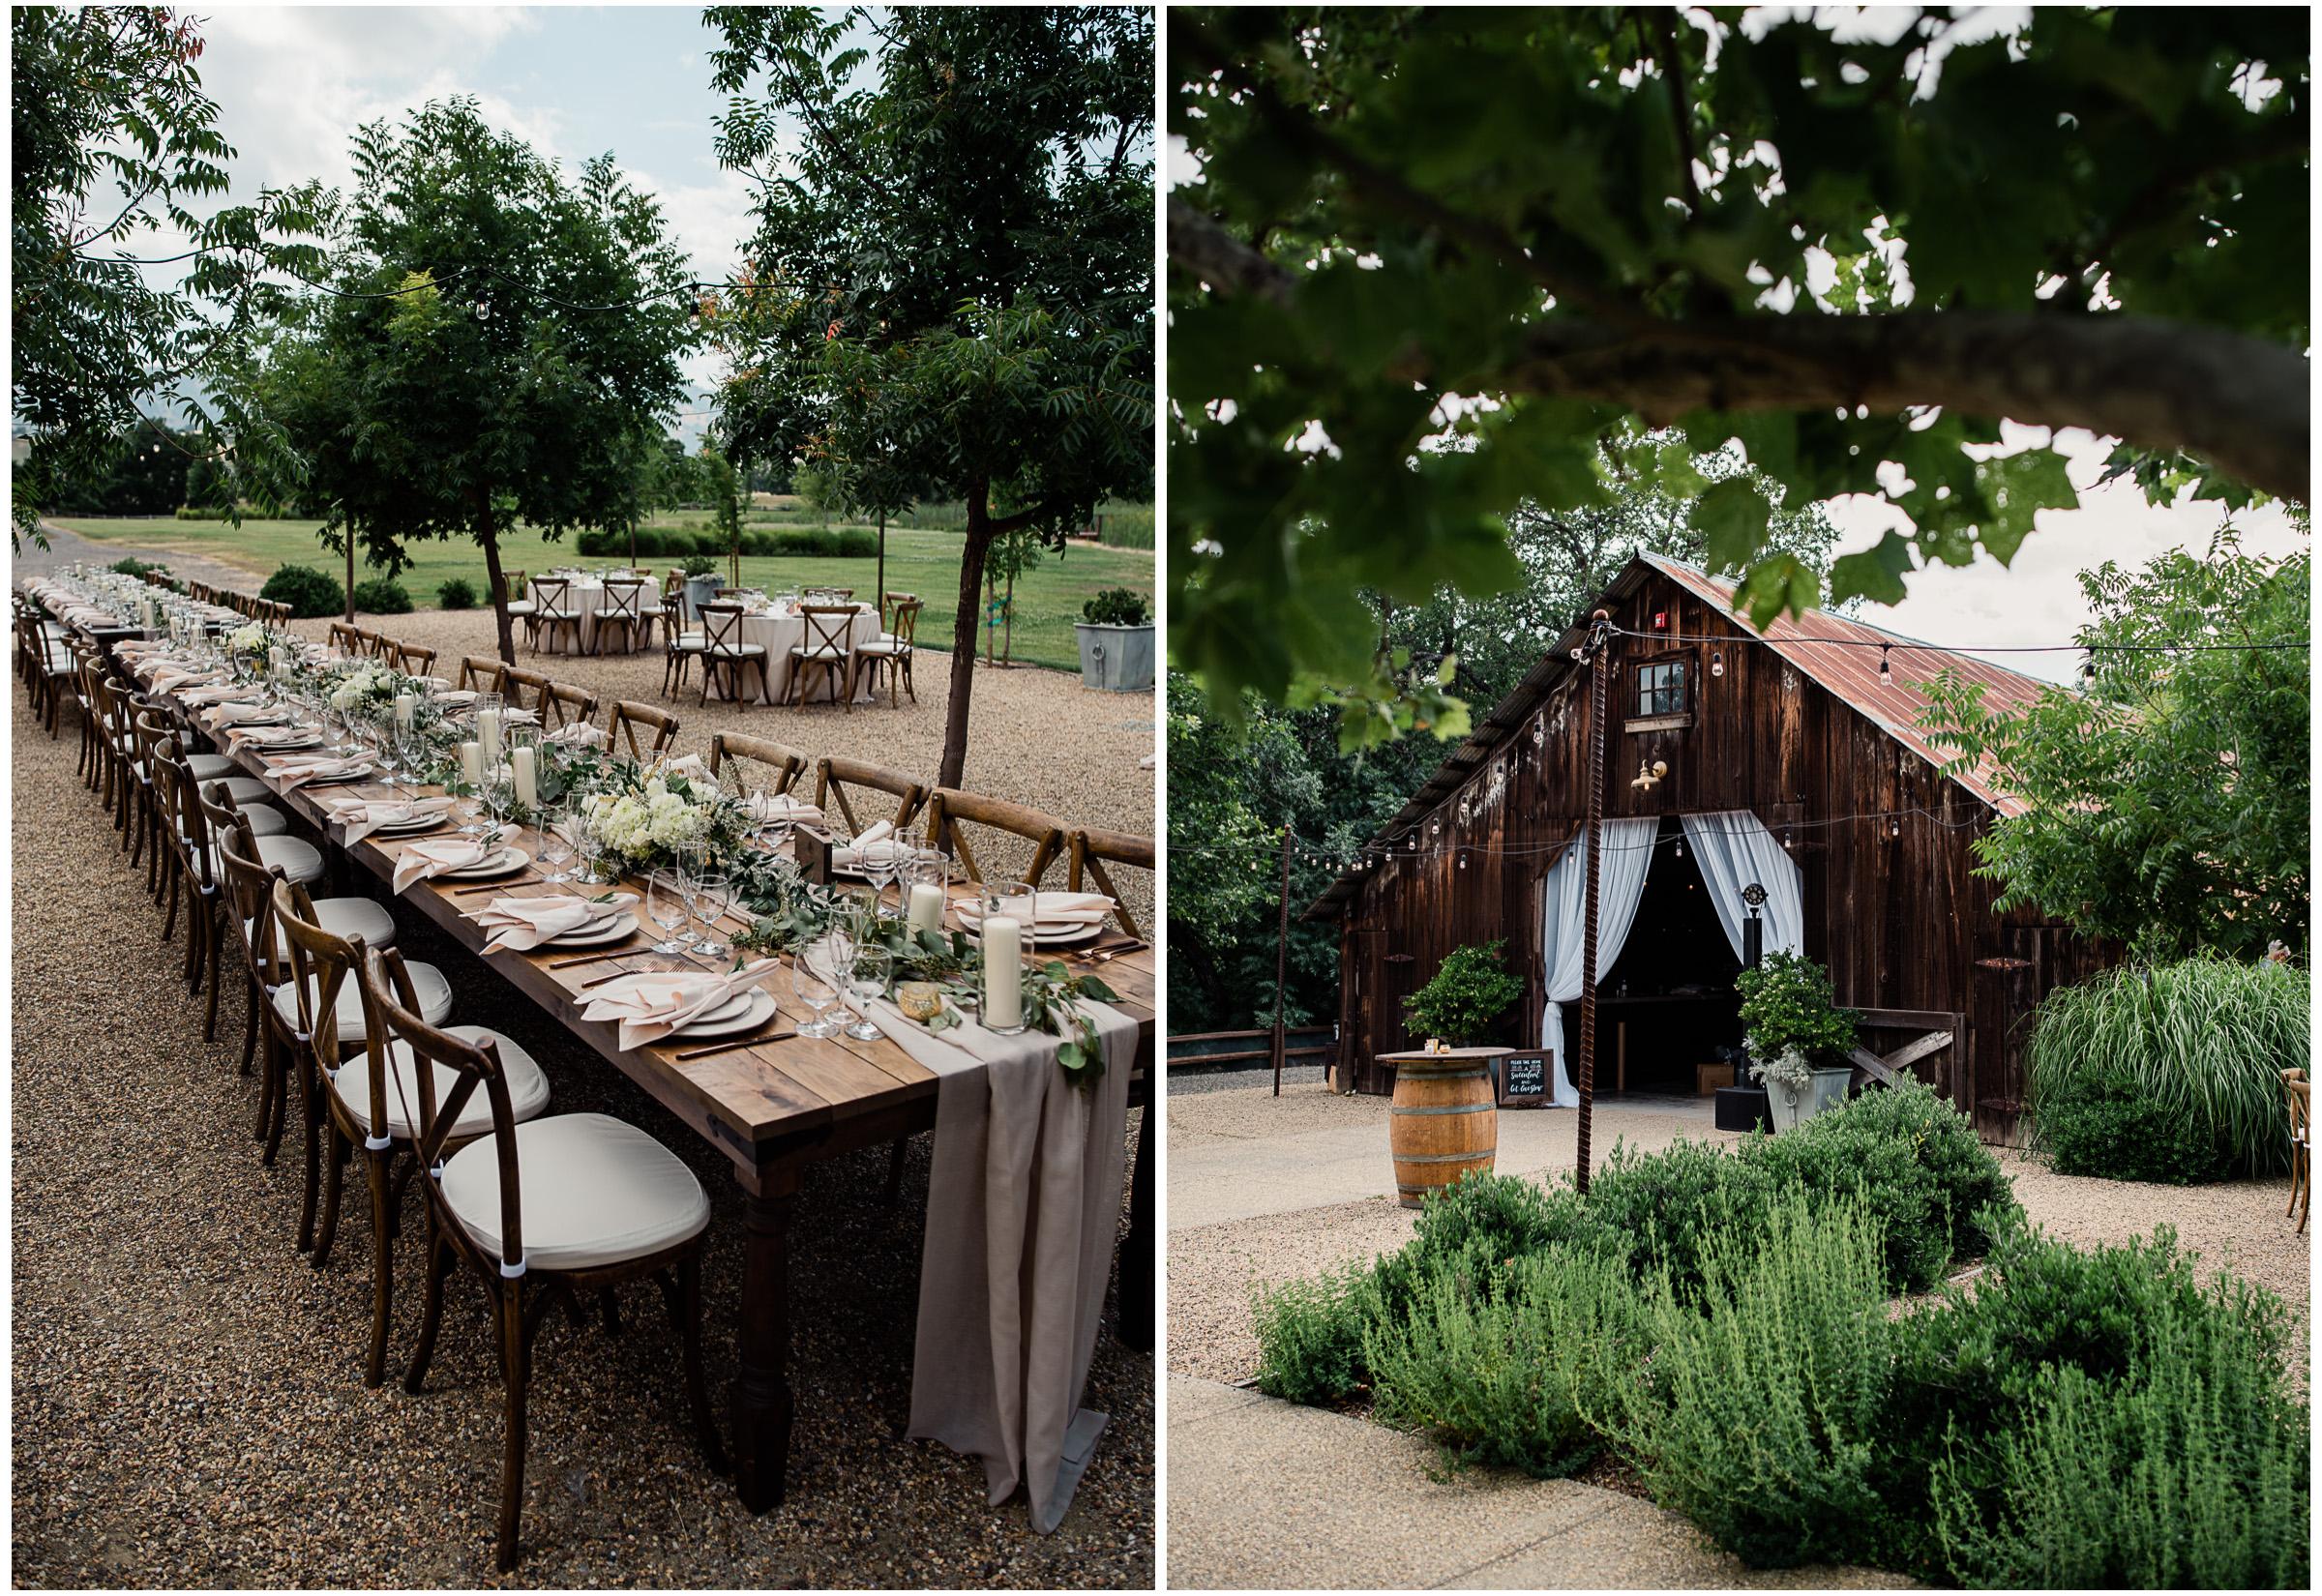 Winters Wedding - Sacramento Photographer - Field & Pond - Justin Wilcox Photography - 22.jpg